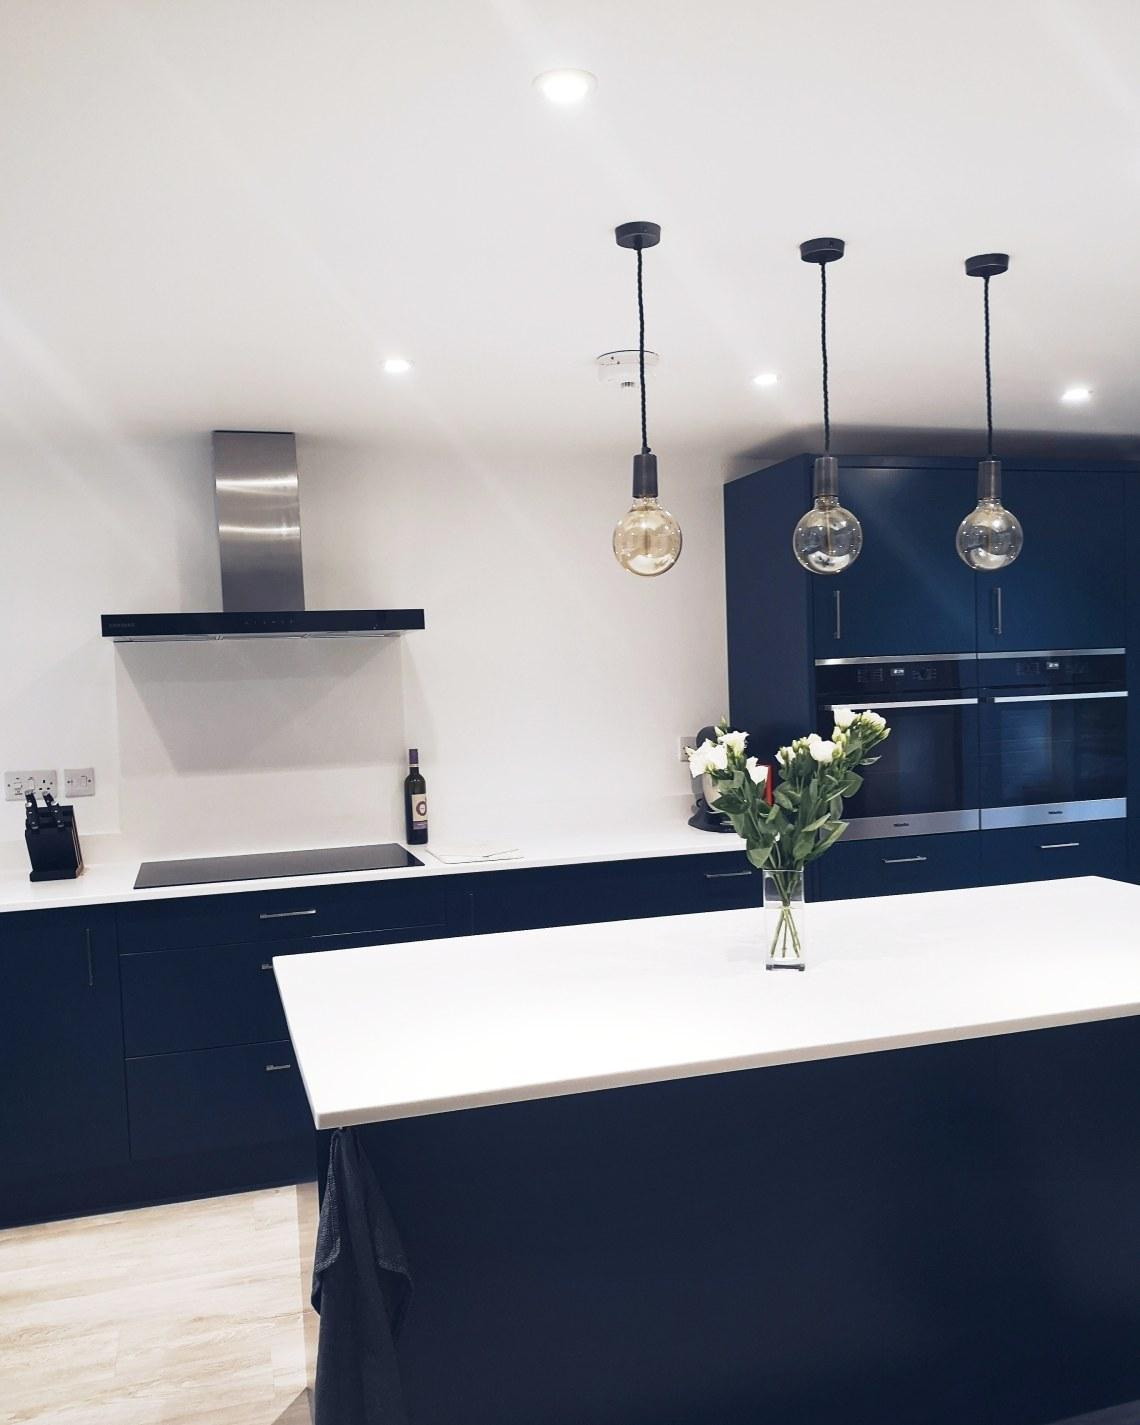 bitesize-bakehouse-kitchen1